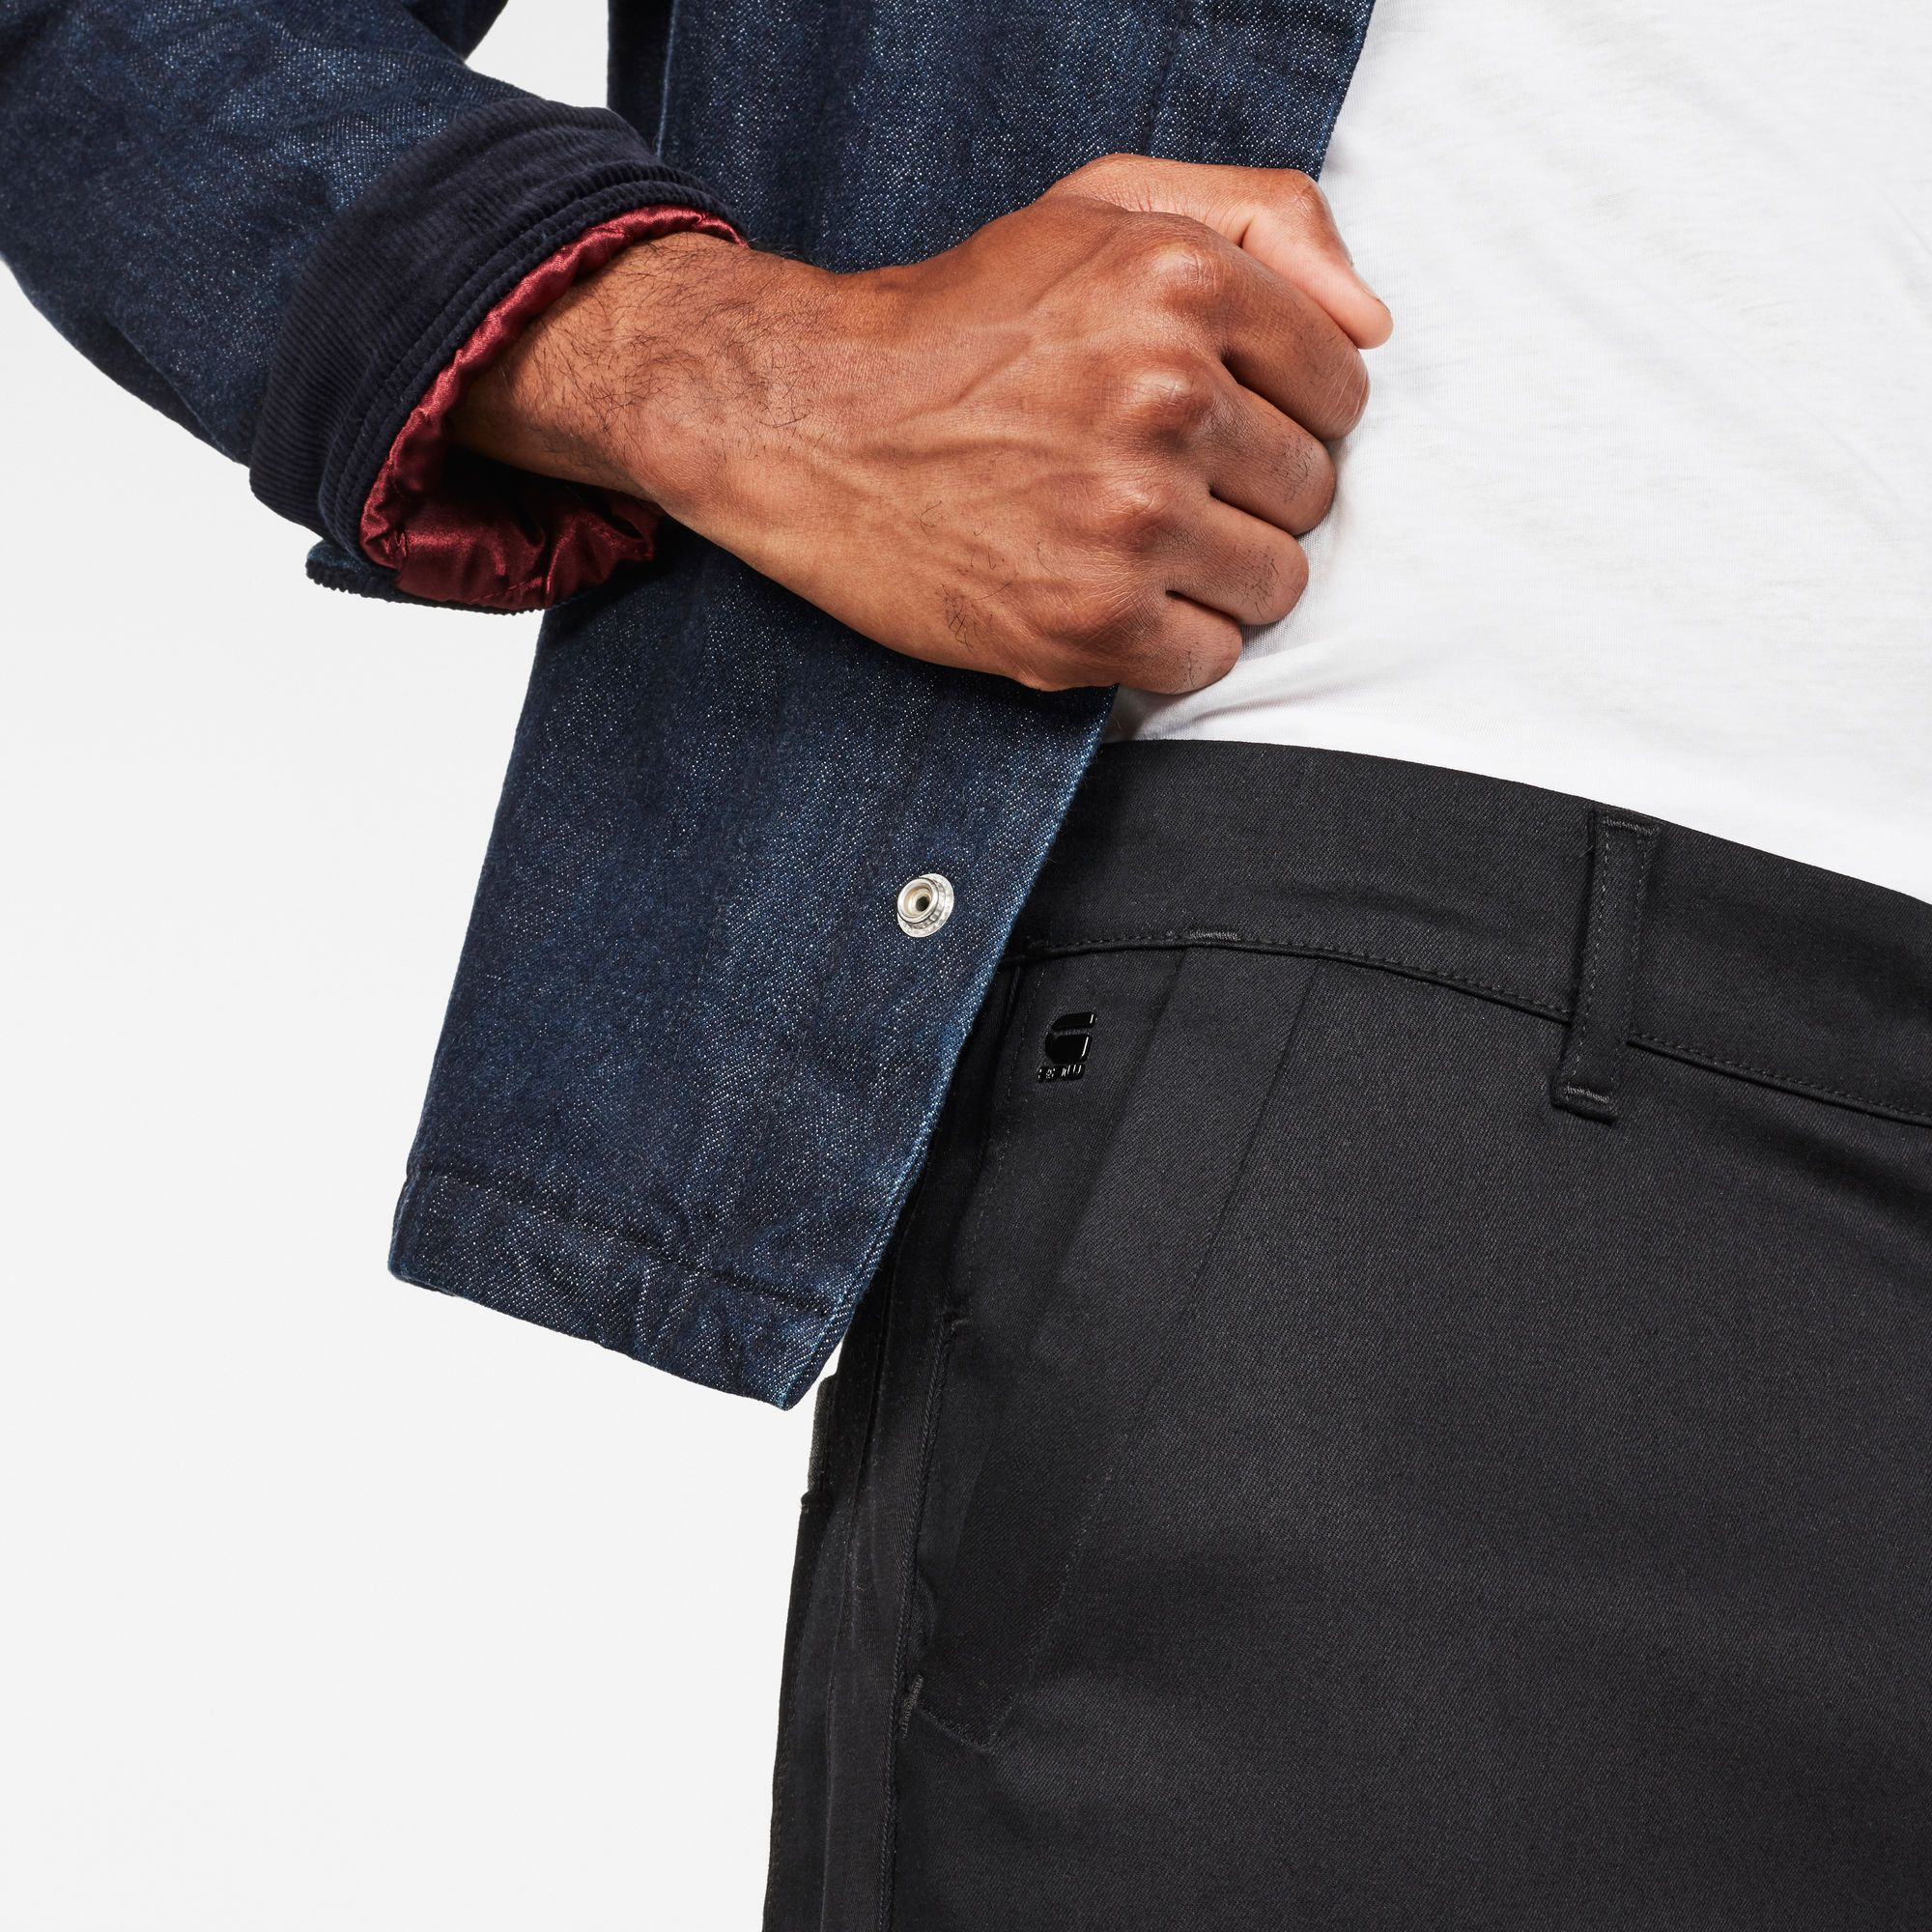 G-Star RAW Bronson Tuxedo Slim Pant